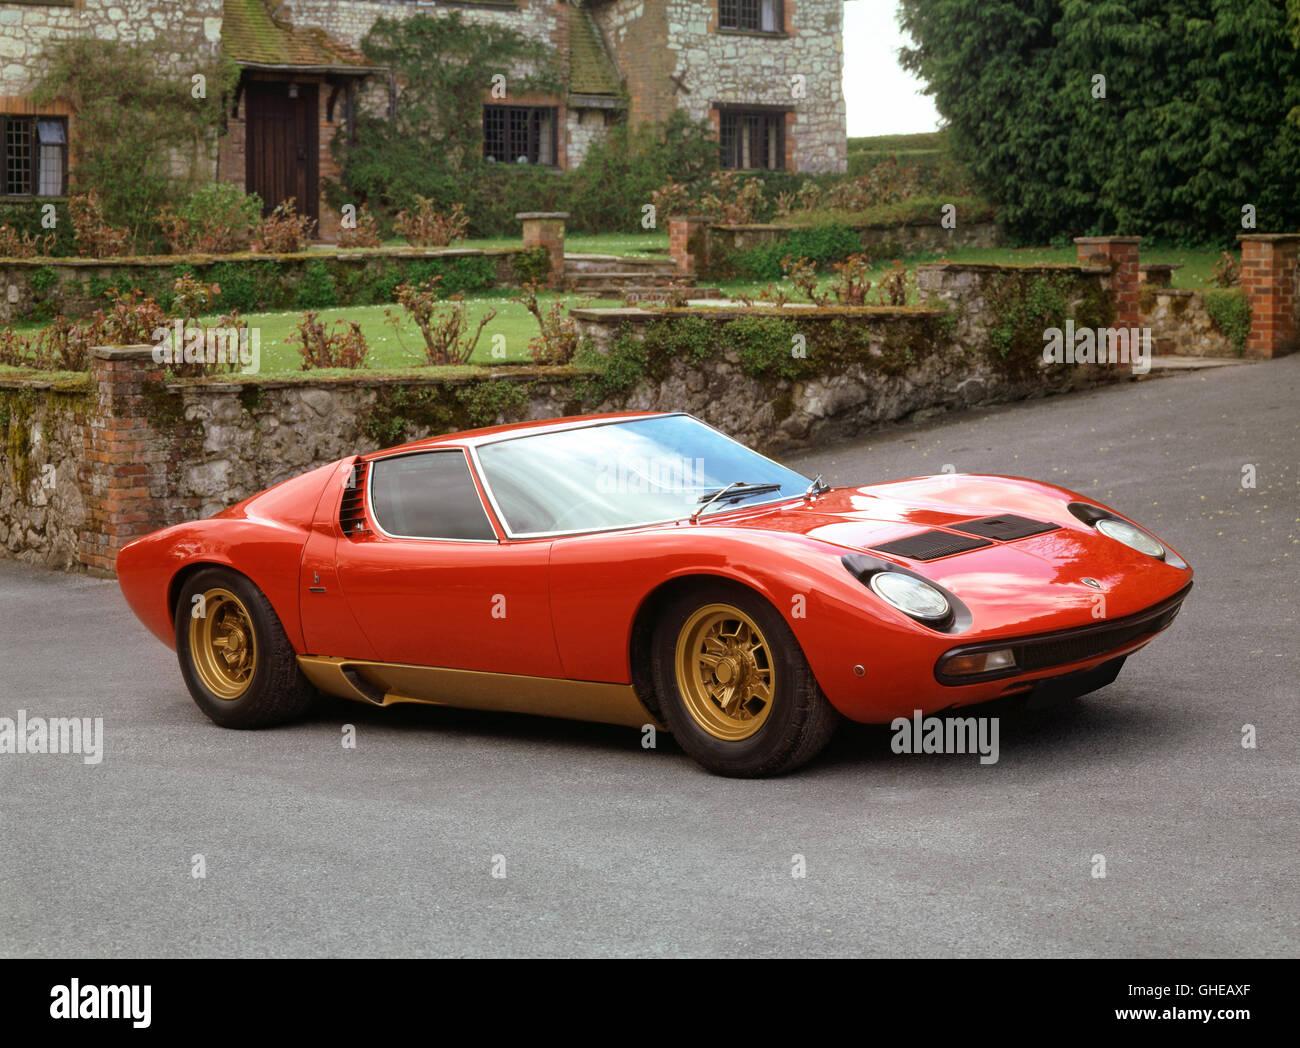 1971 Lamborghini Miura P400 SV V12 4 0 litre engine producing 385 bhp Bodywork built by Bertone Country of origin - Stock Image